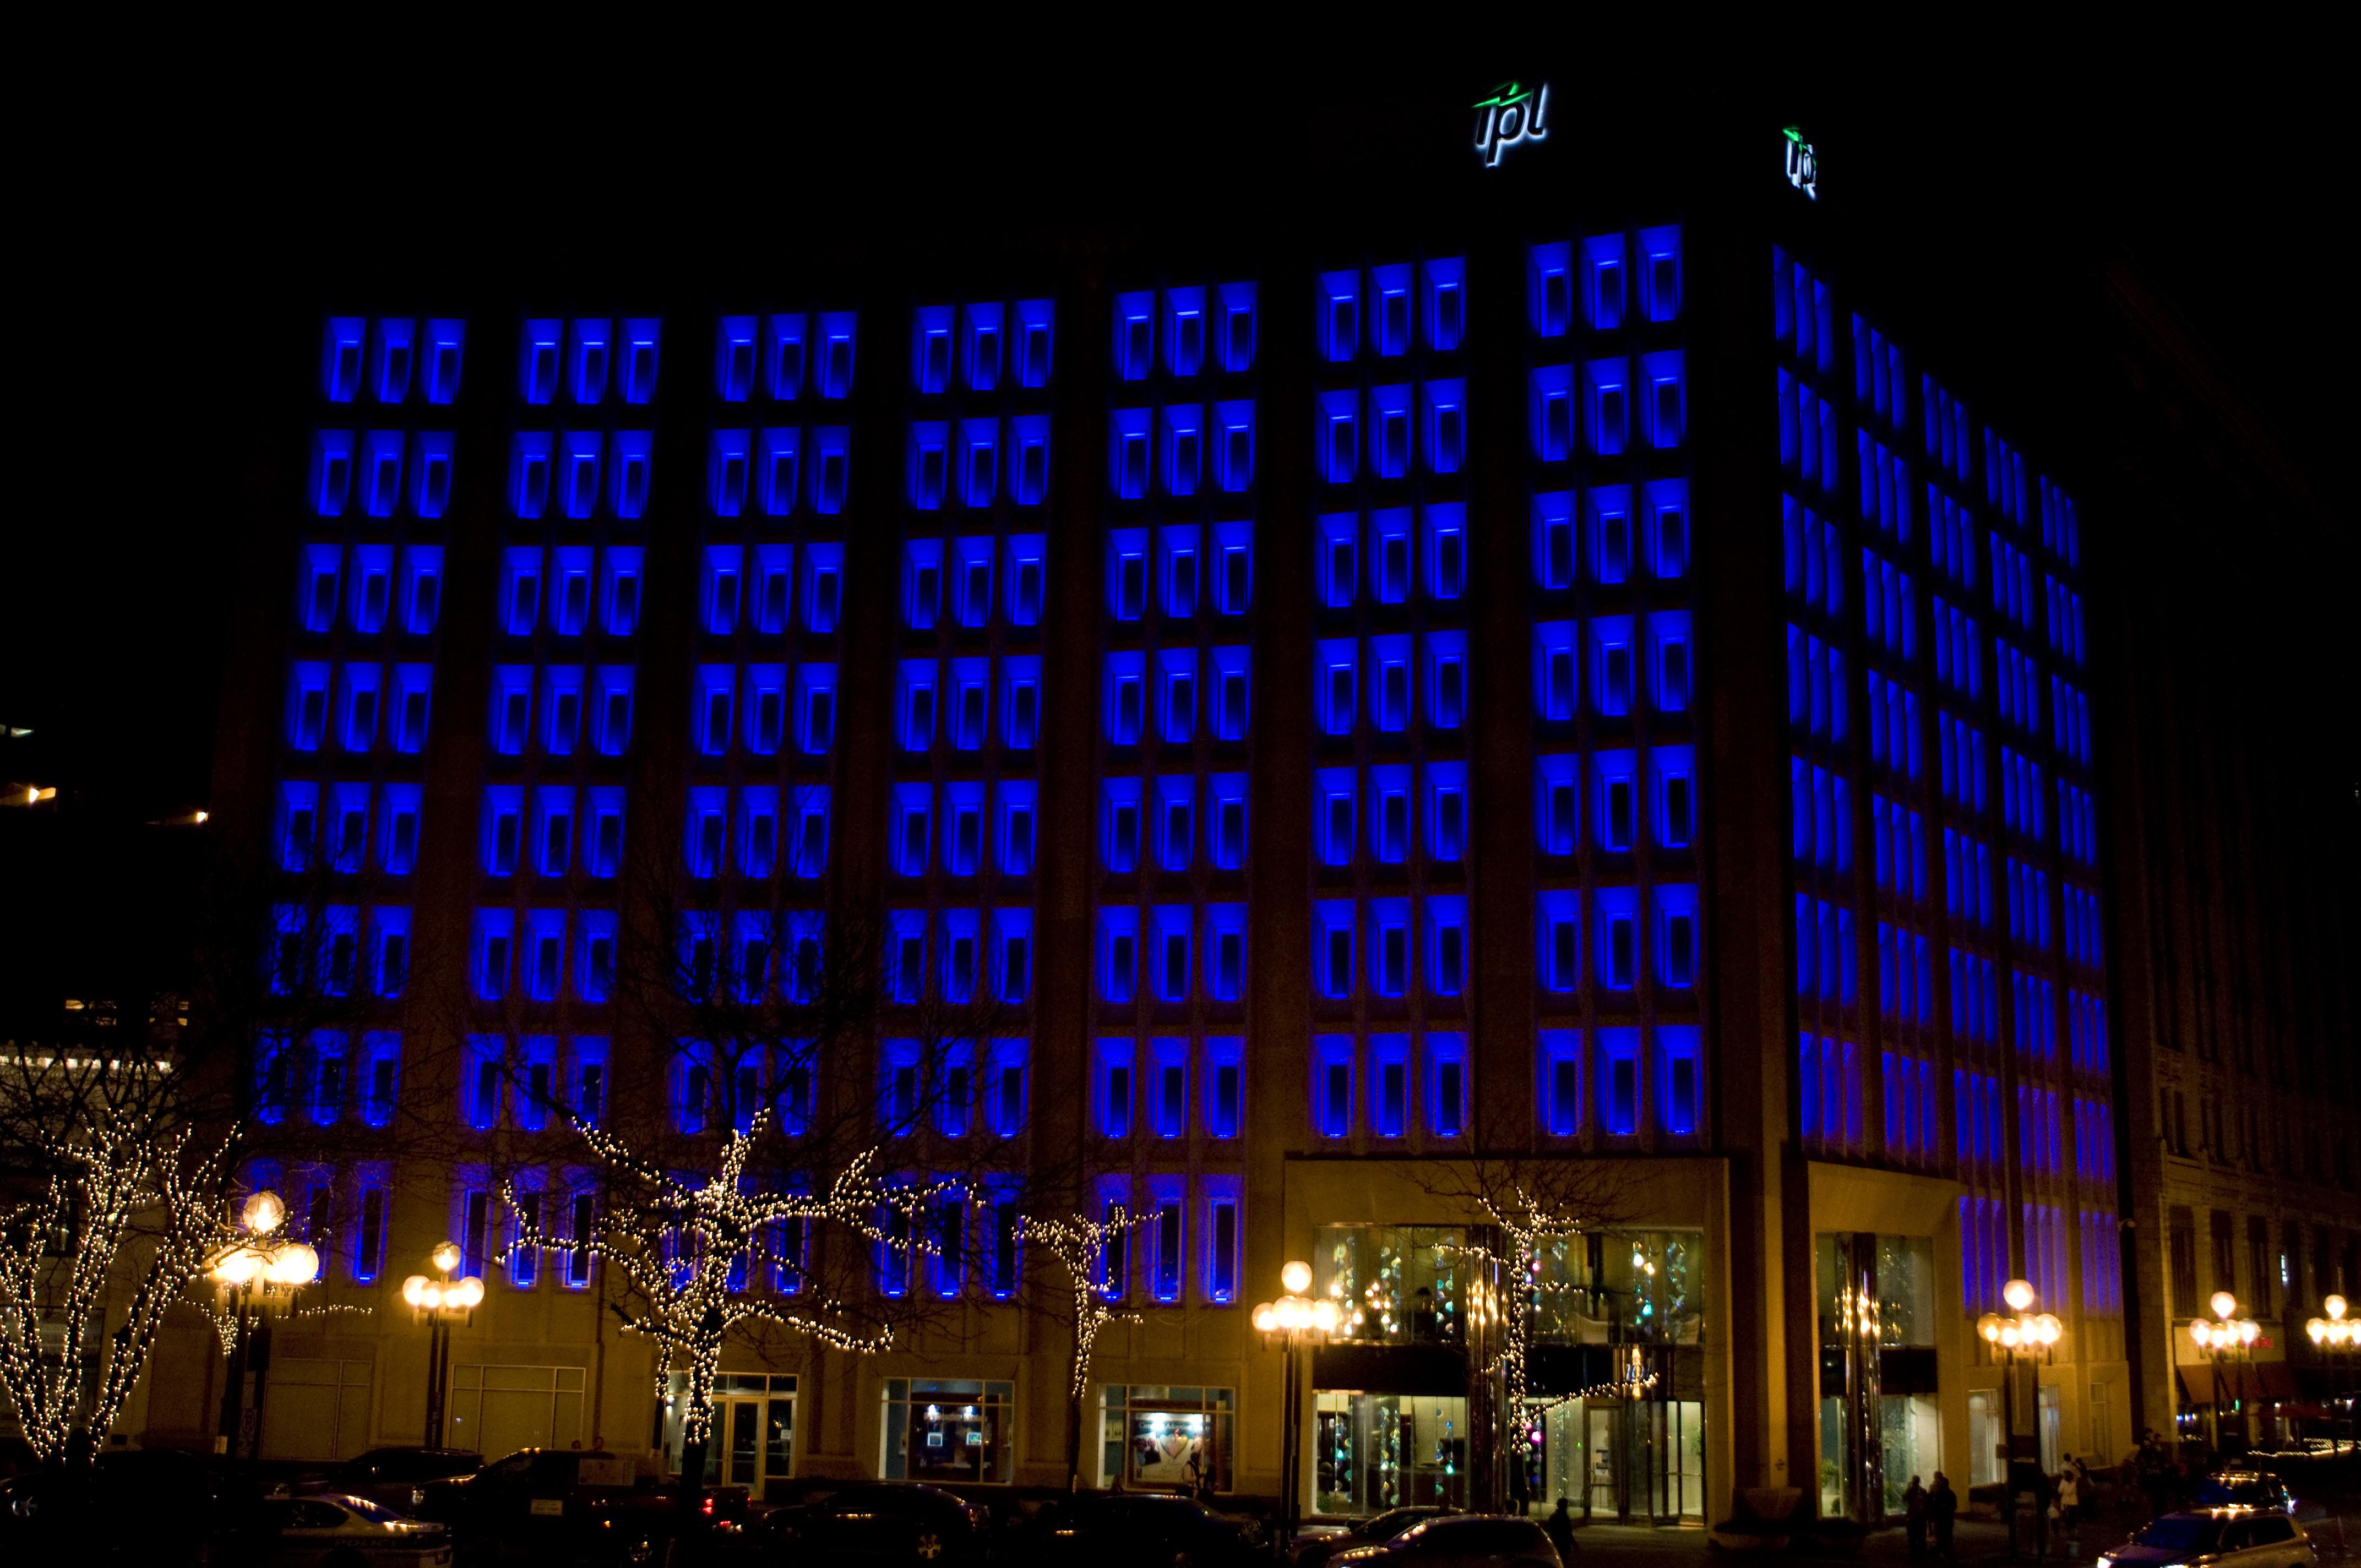 File Downtown Ipl Building Night Jpg Wikimedia Commons